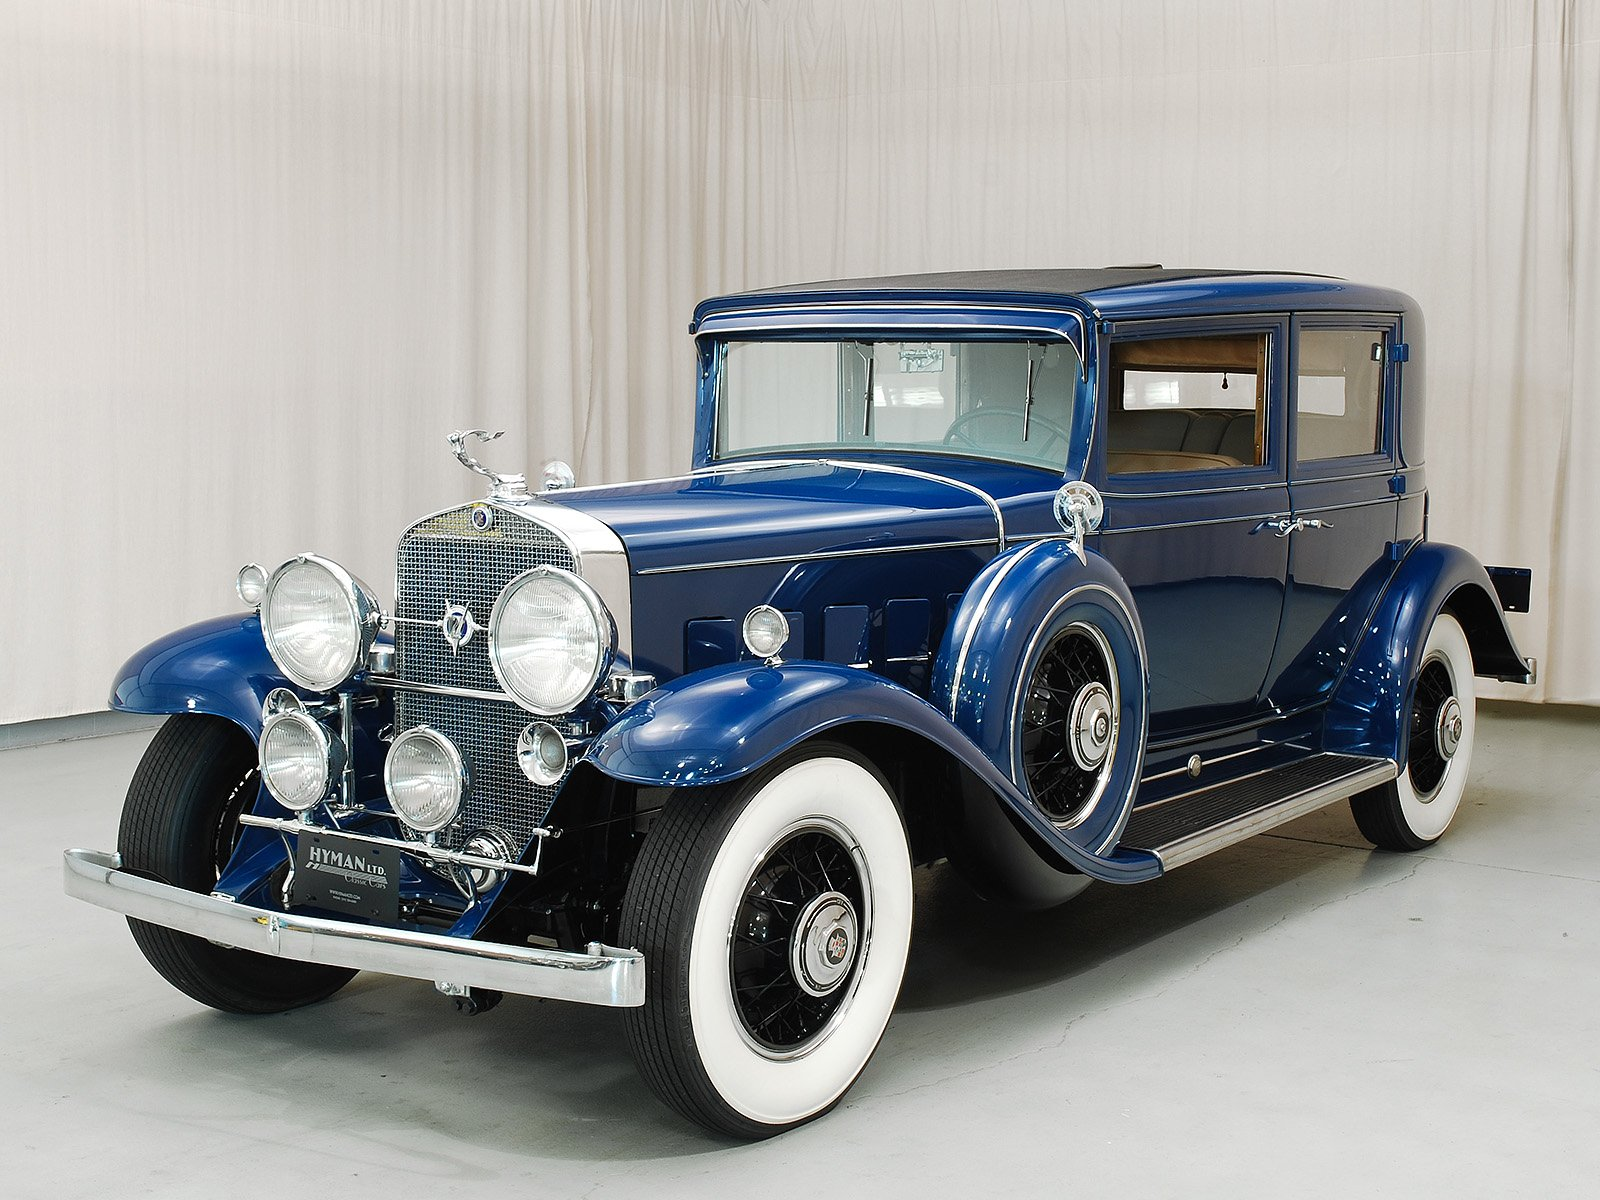 1931 Cadillac V12 Coupe Hyman Ltd Classic Cars